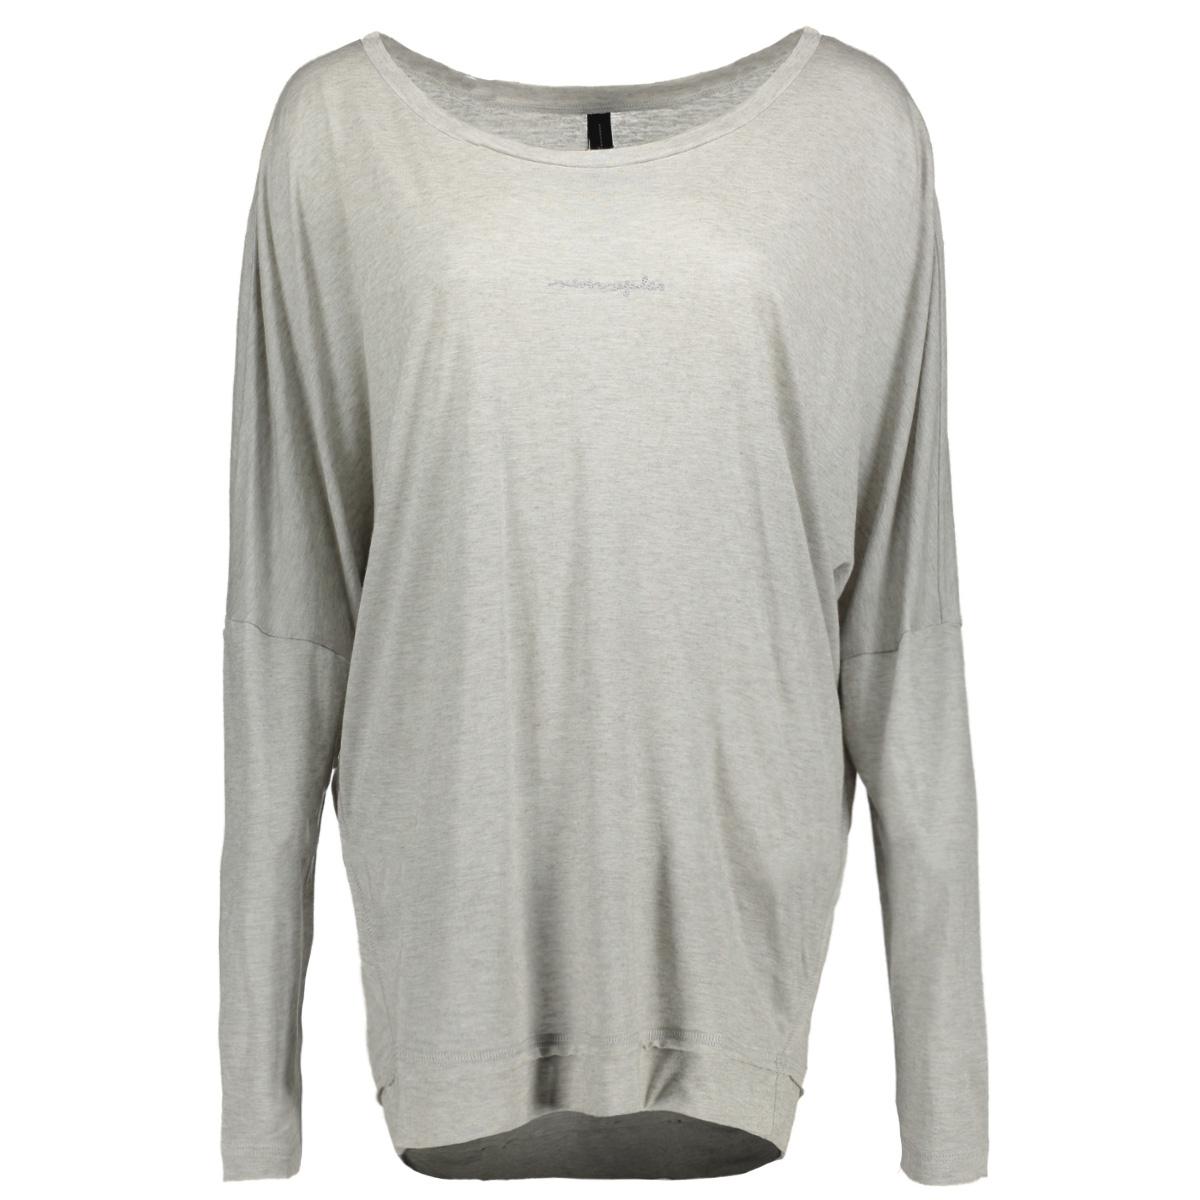 20-778-7103 10 days t-shirt light grey